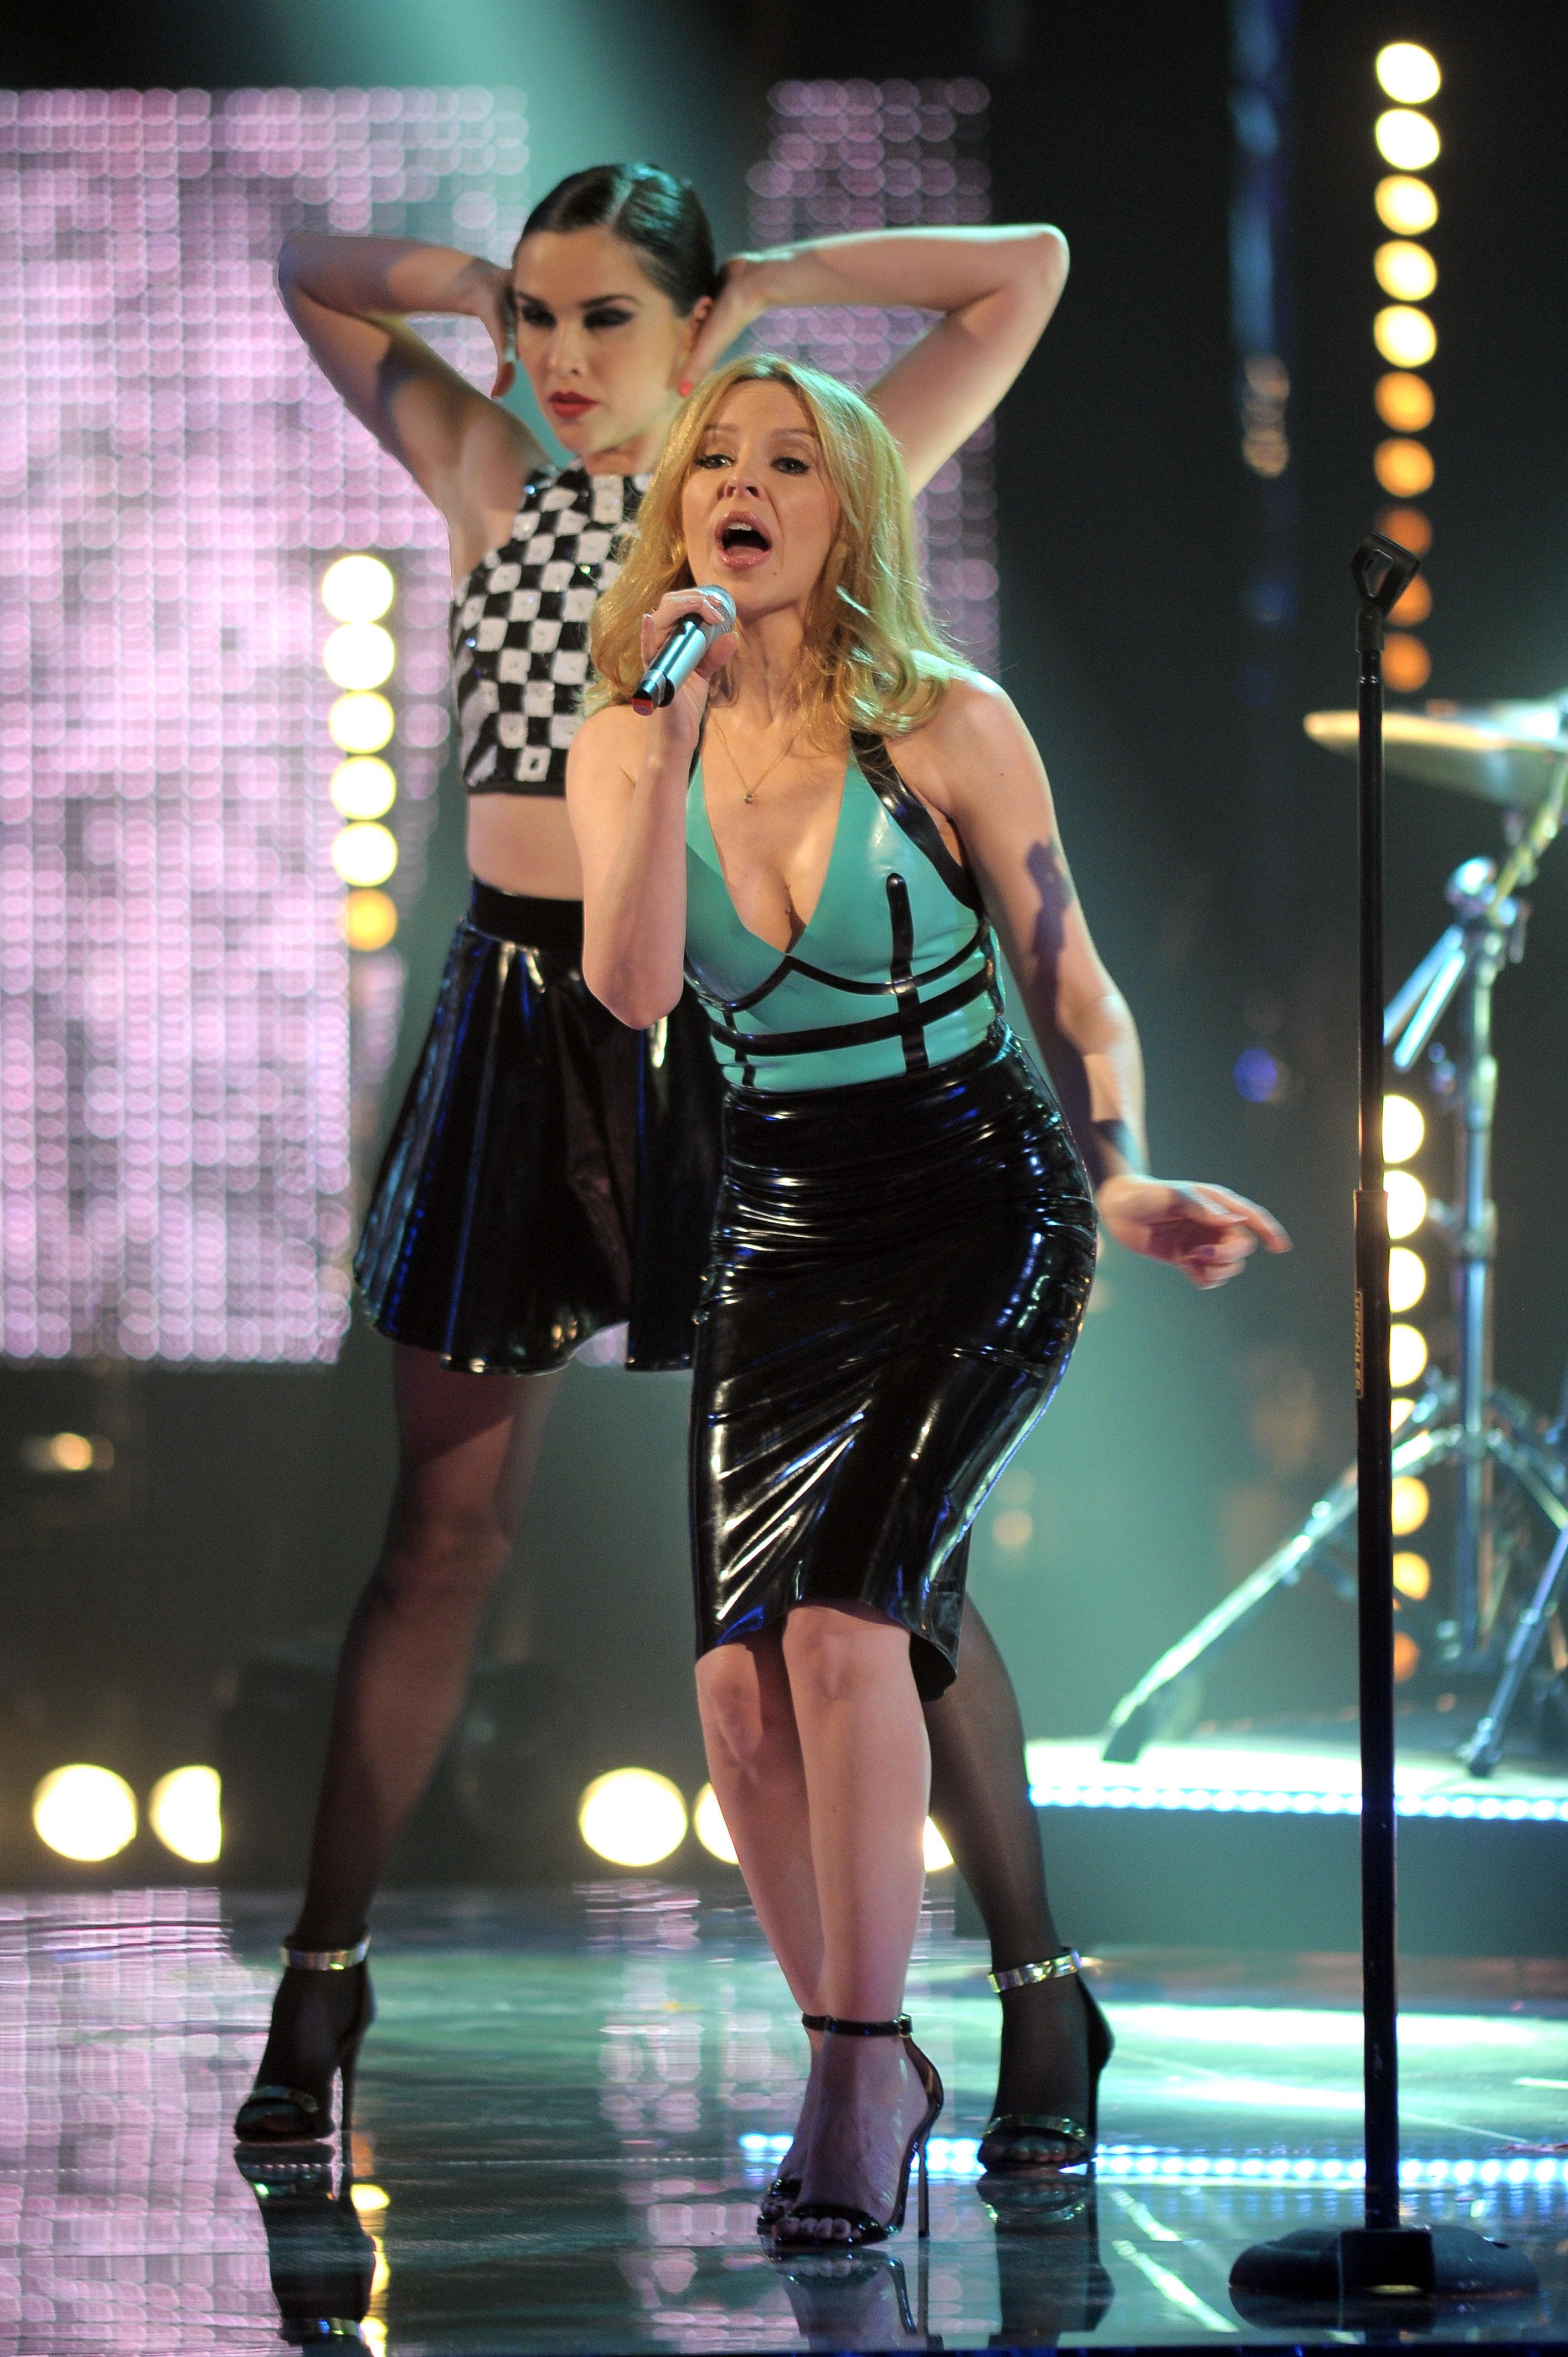 Kylie X Jordyn Collection Gloss: 2832 X 4256 Id. 1322916